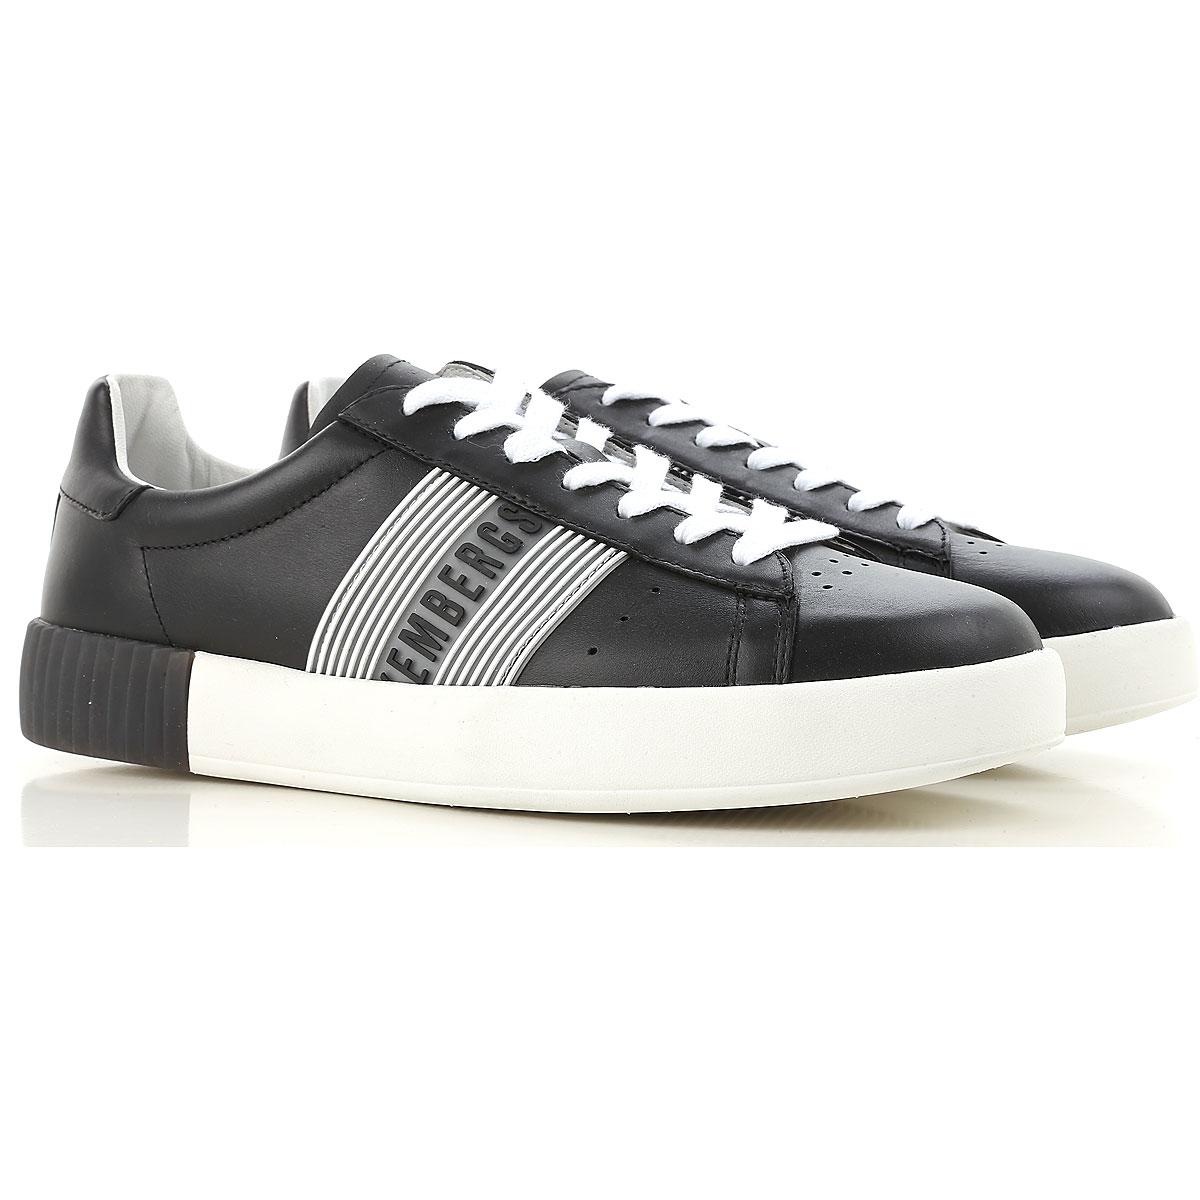 Dirk Bikkembergs Sneaker Homme Pas cher en Soldes, Noir, Cuir, 2017, 39.5 42 43 44.5 46